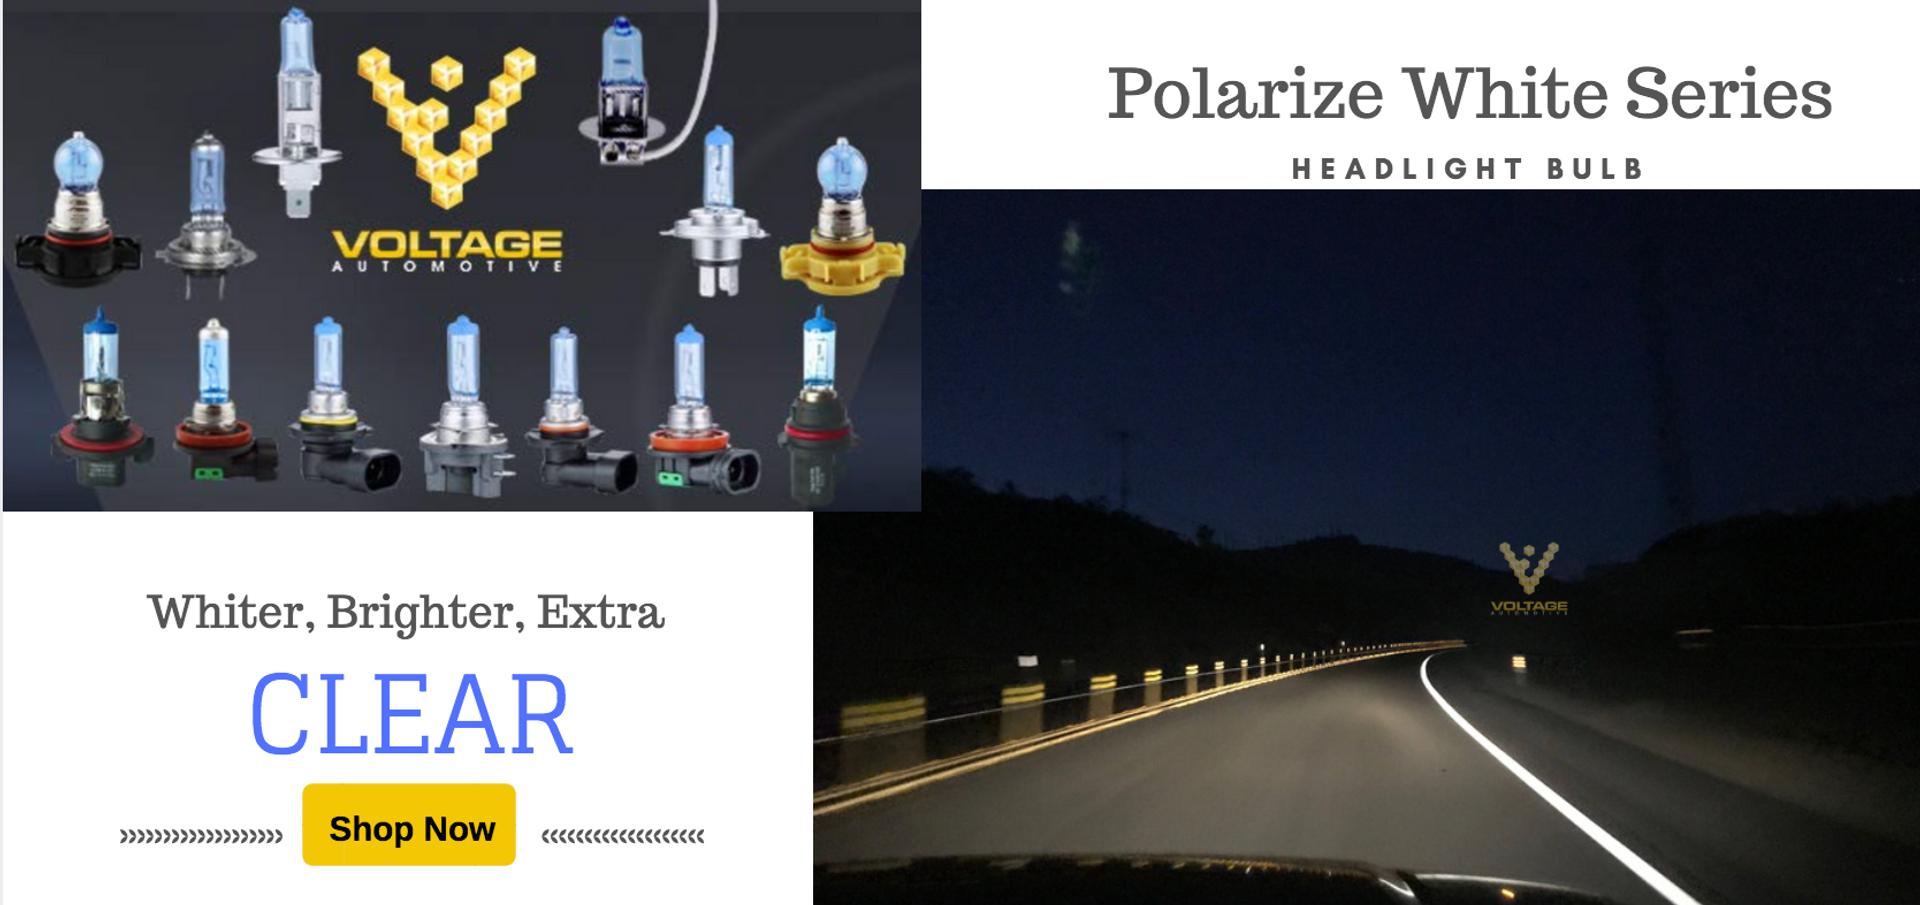 VOltage Automotive Polarize White Headligth Bulb